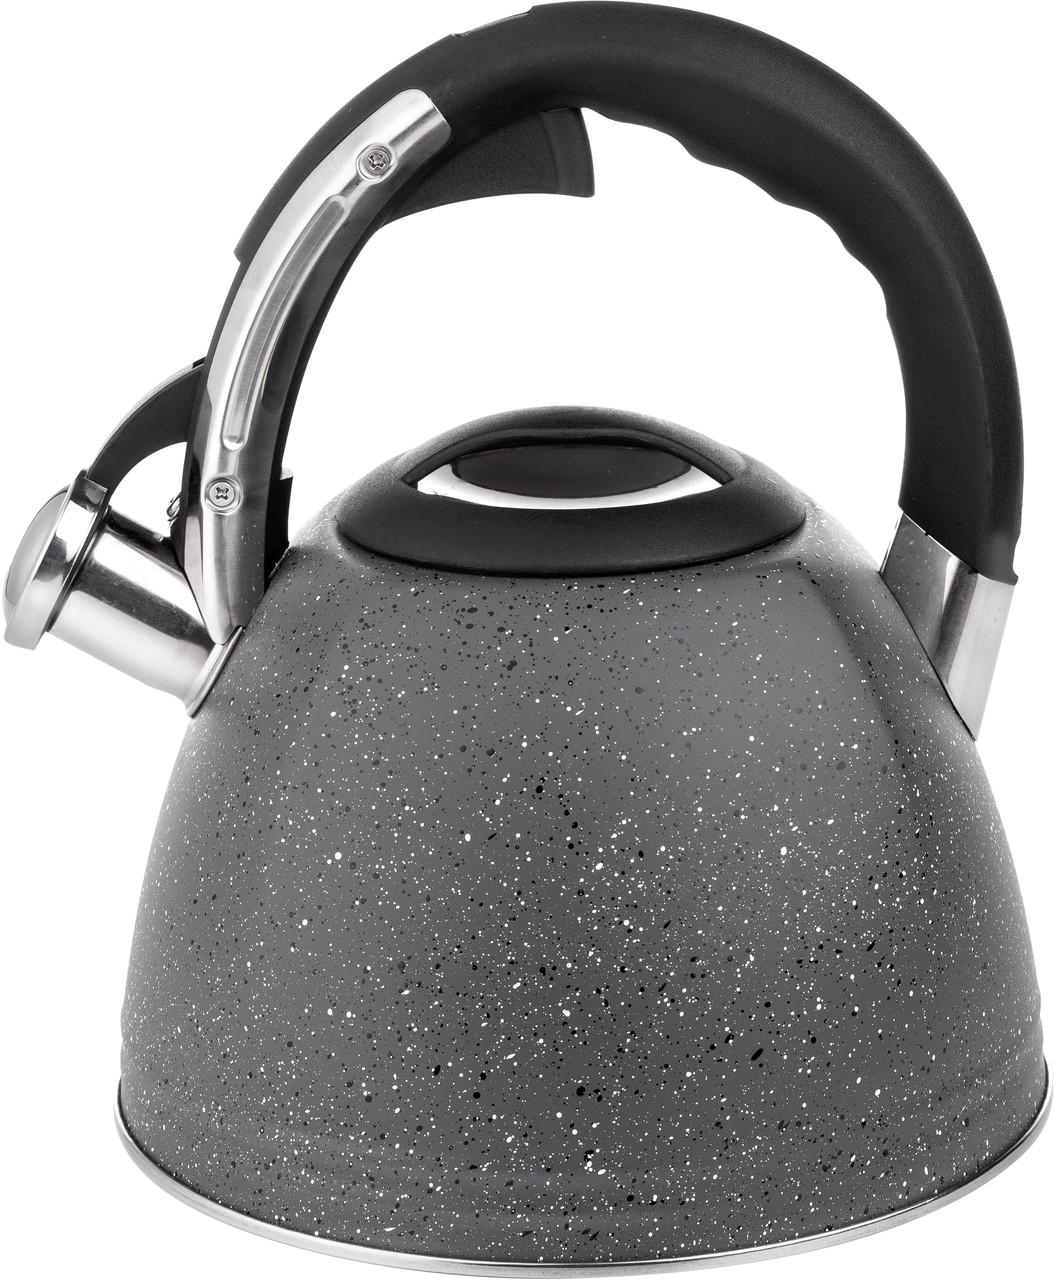 Чайник Florina Onyx со свистком 2.5 л (5C7597)